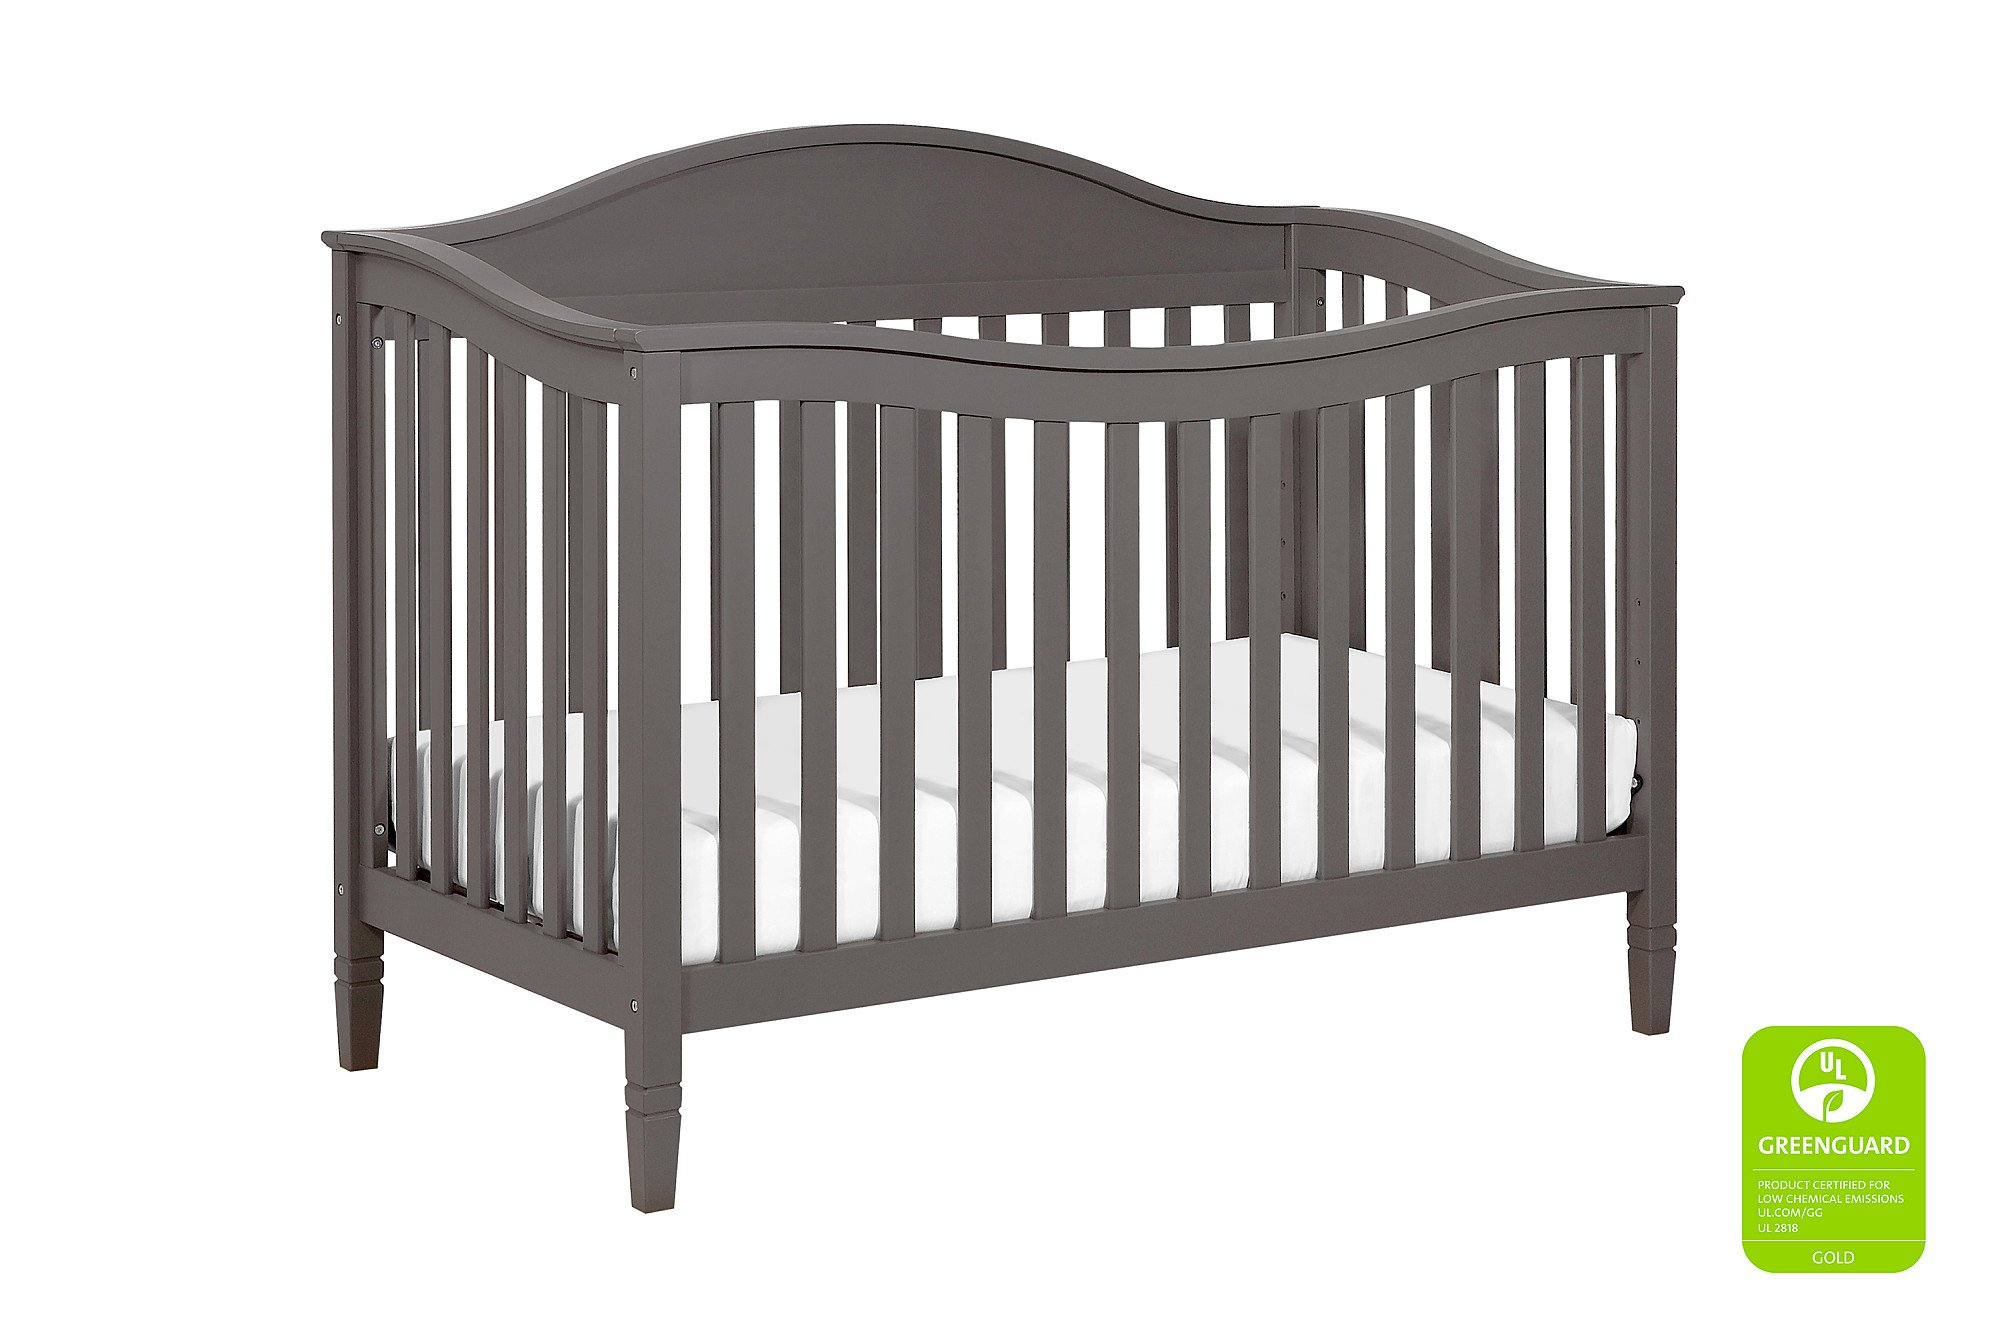 DaVinci Laurel 4-in-1 Crib Full Size Conversion Kit Bed Rails - Slate